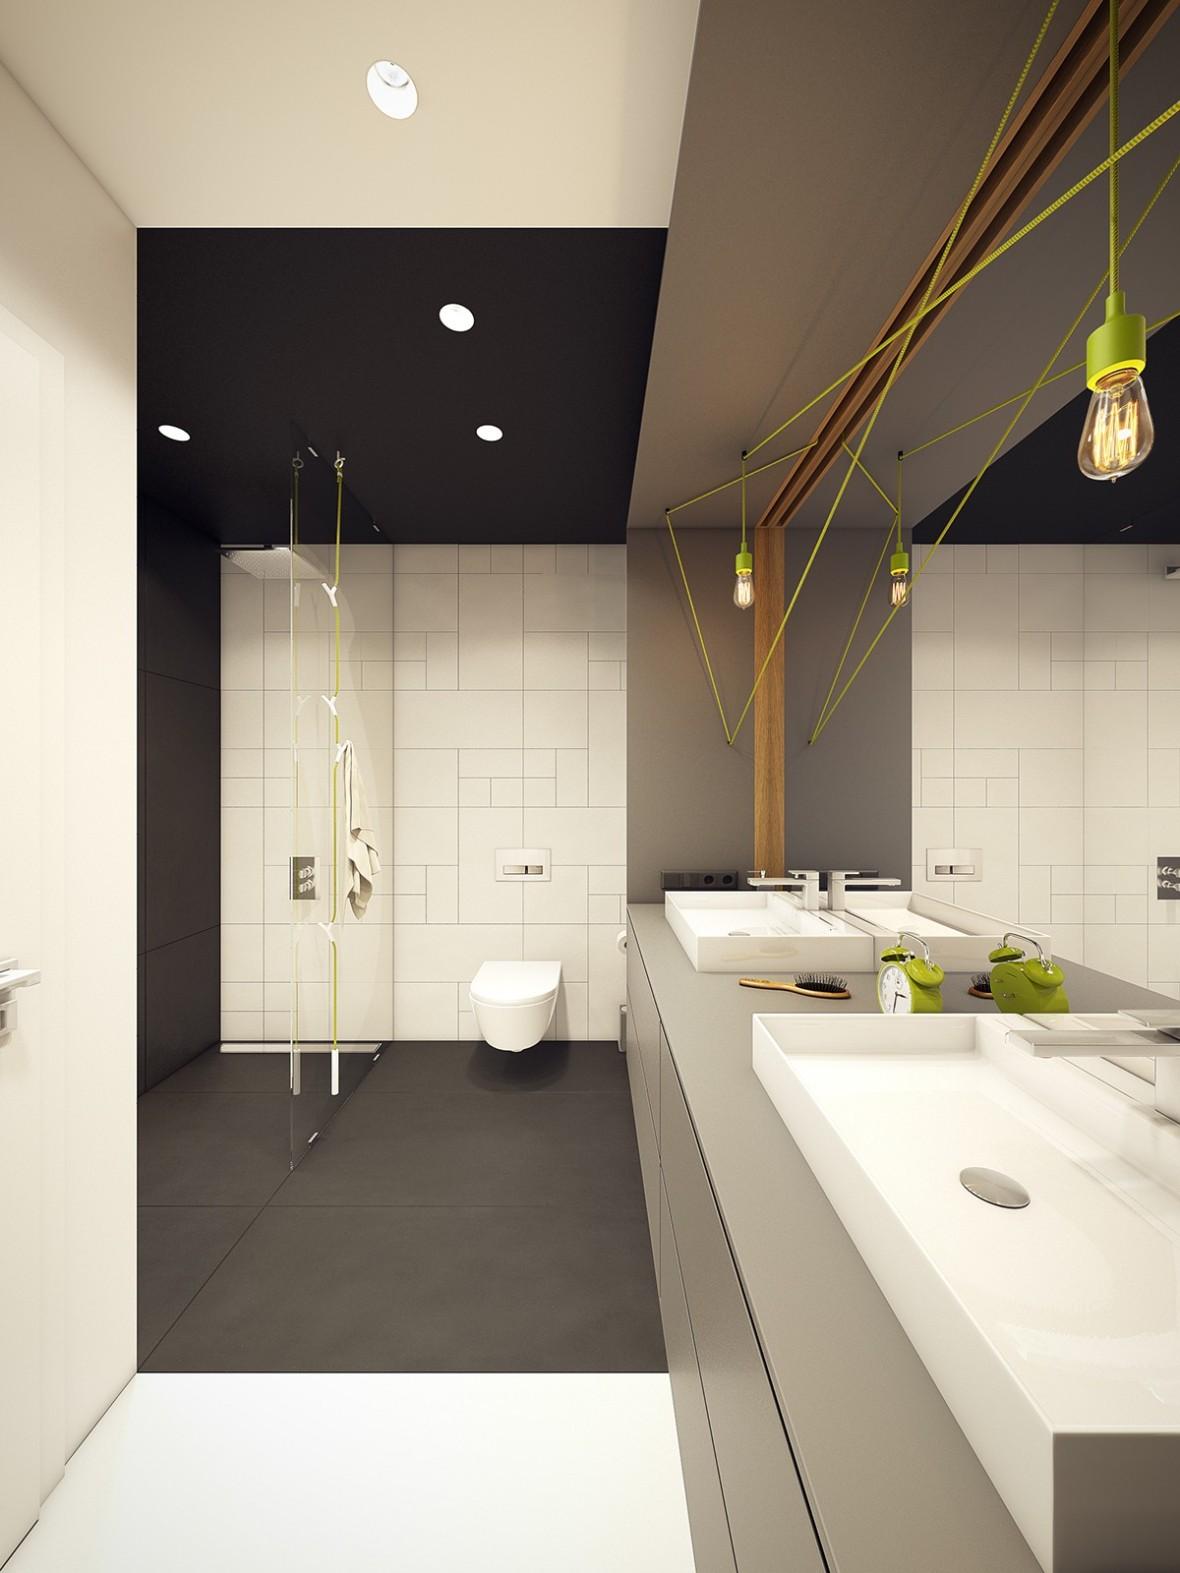 lime-green-and-black-bathroom-ideas